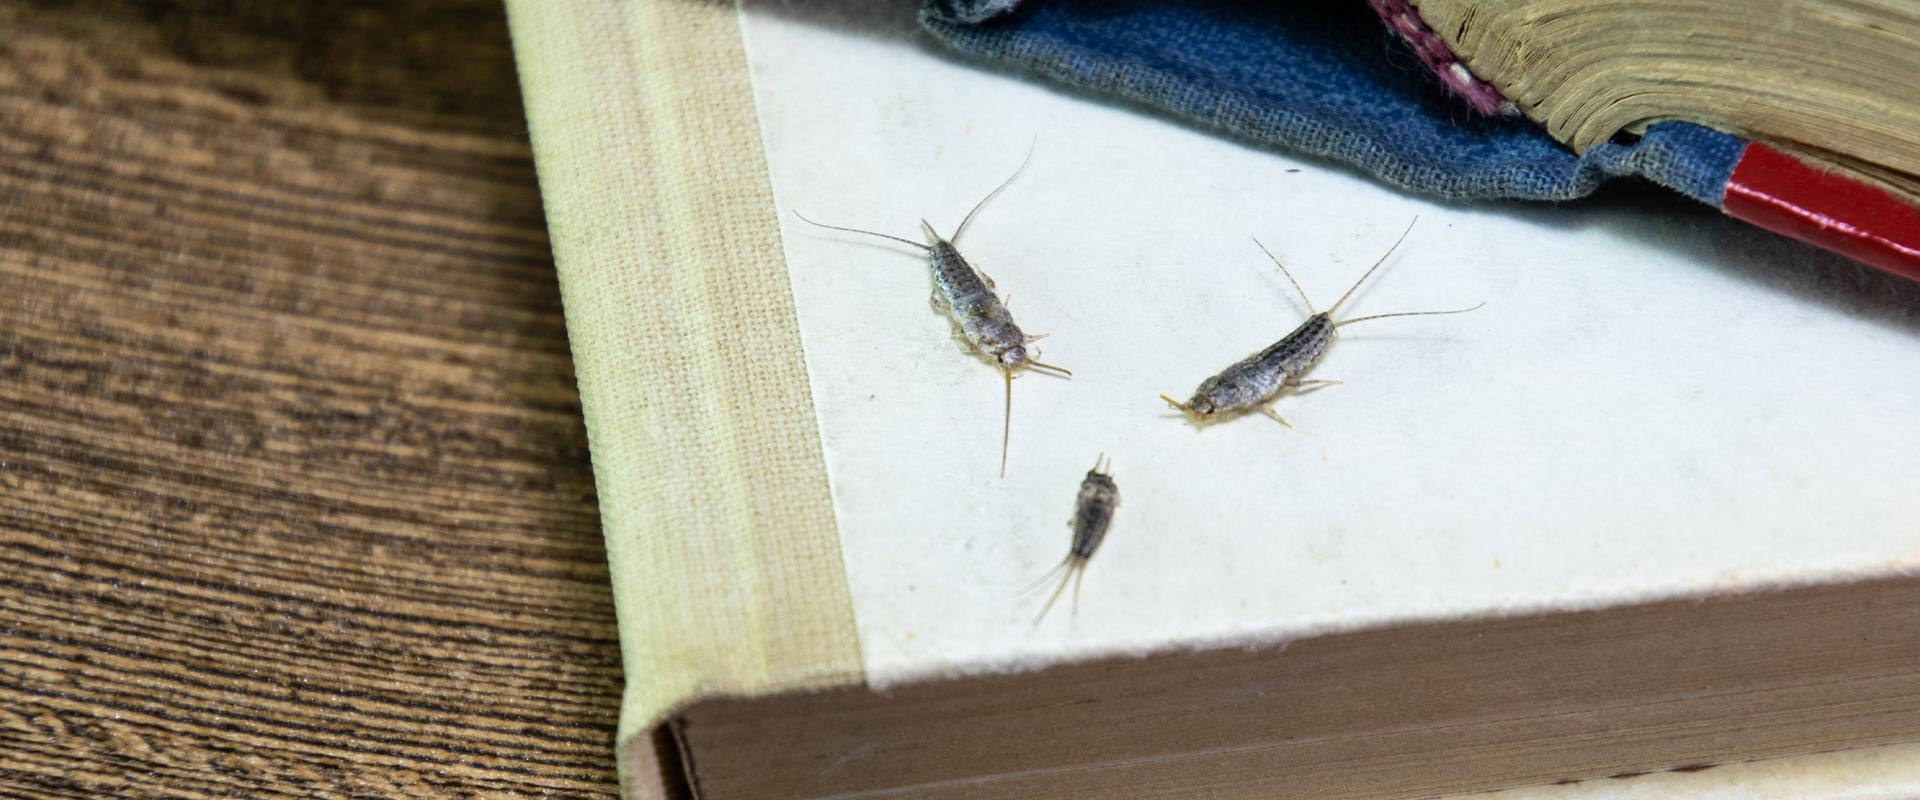 three silverfish in a book